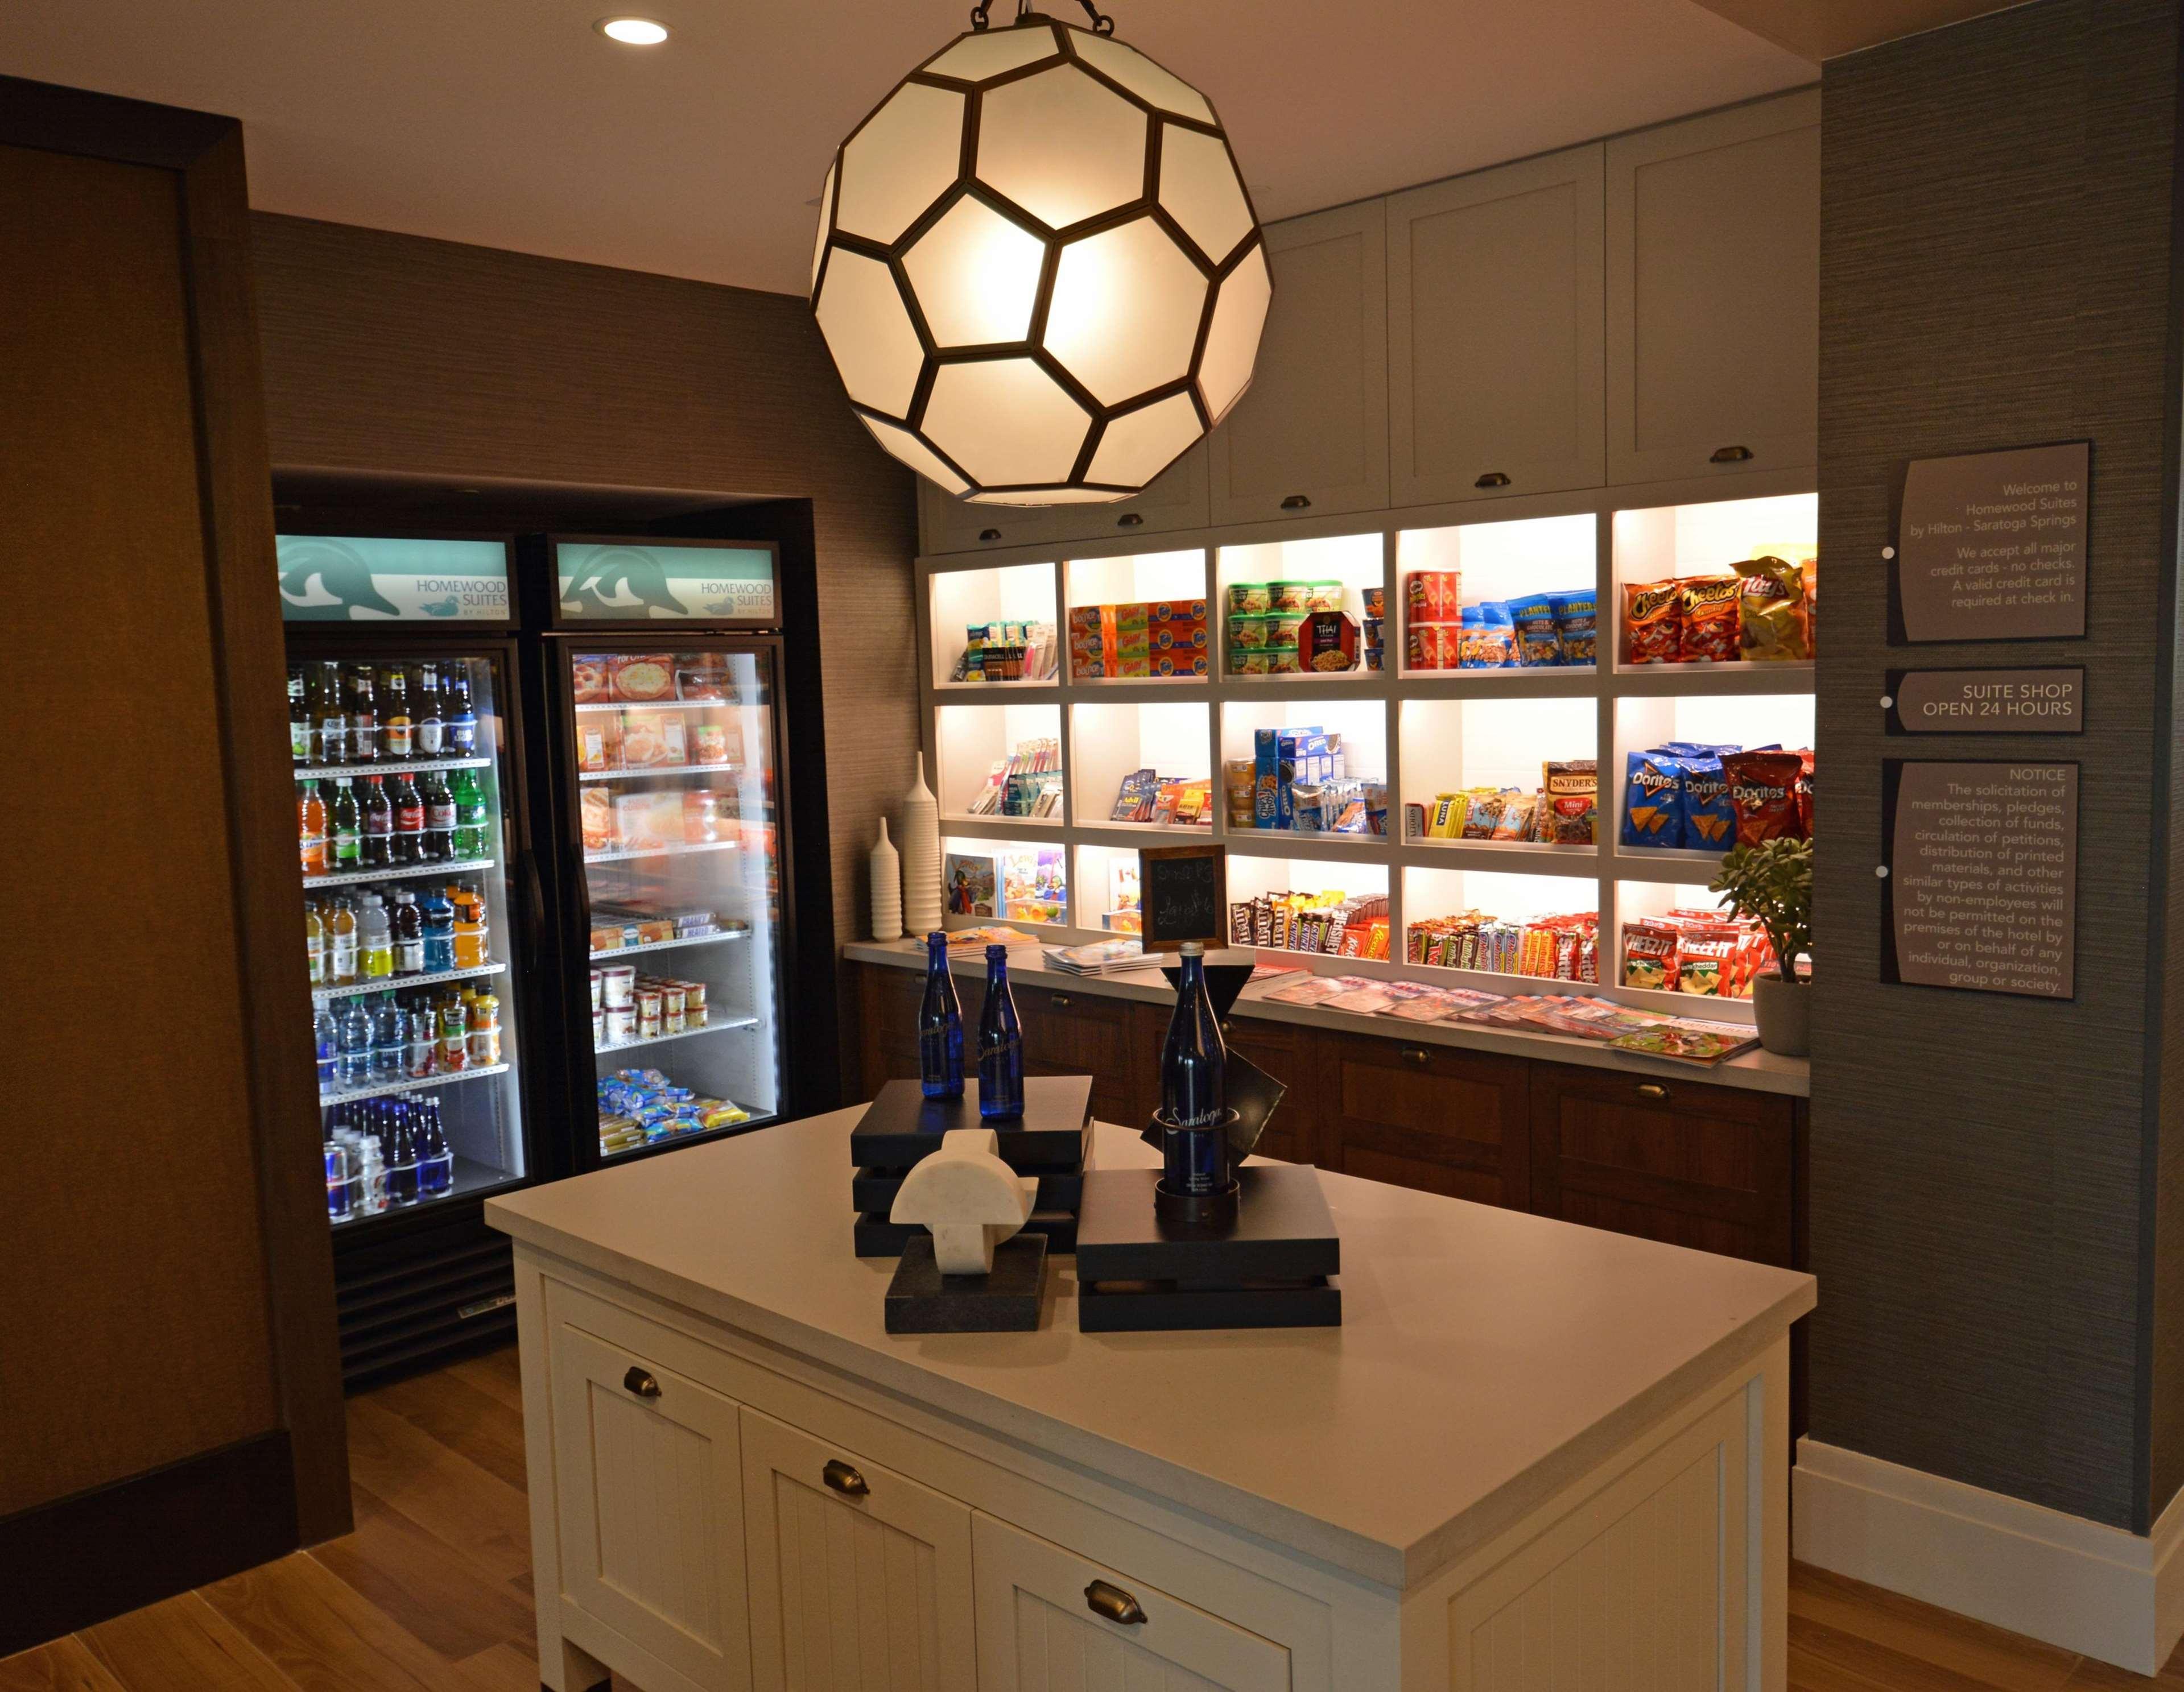 Homewood Suites by Hilton Saratoga Springs image 8